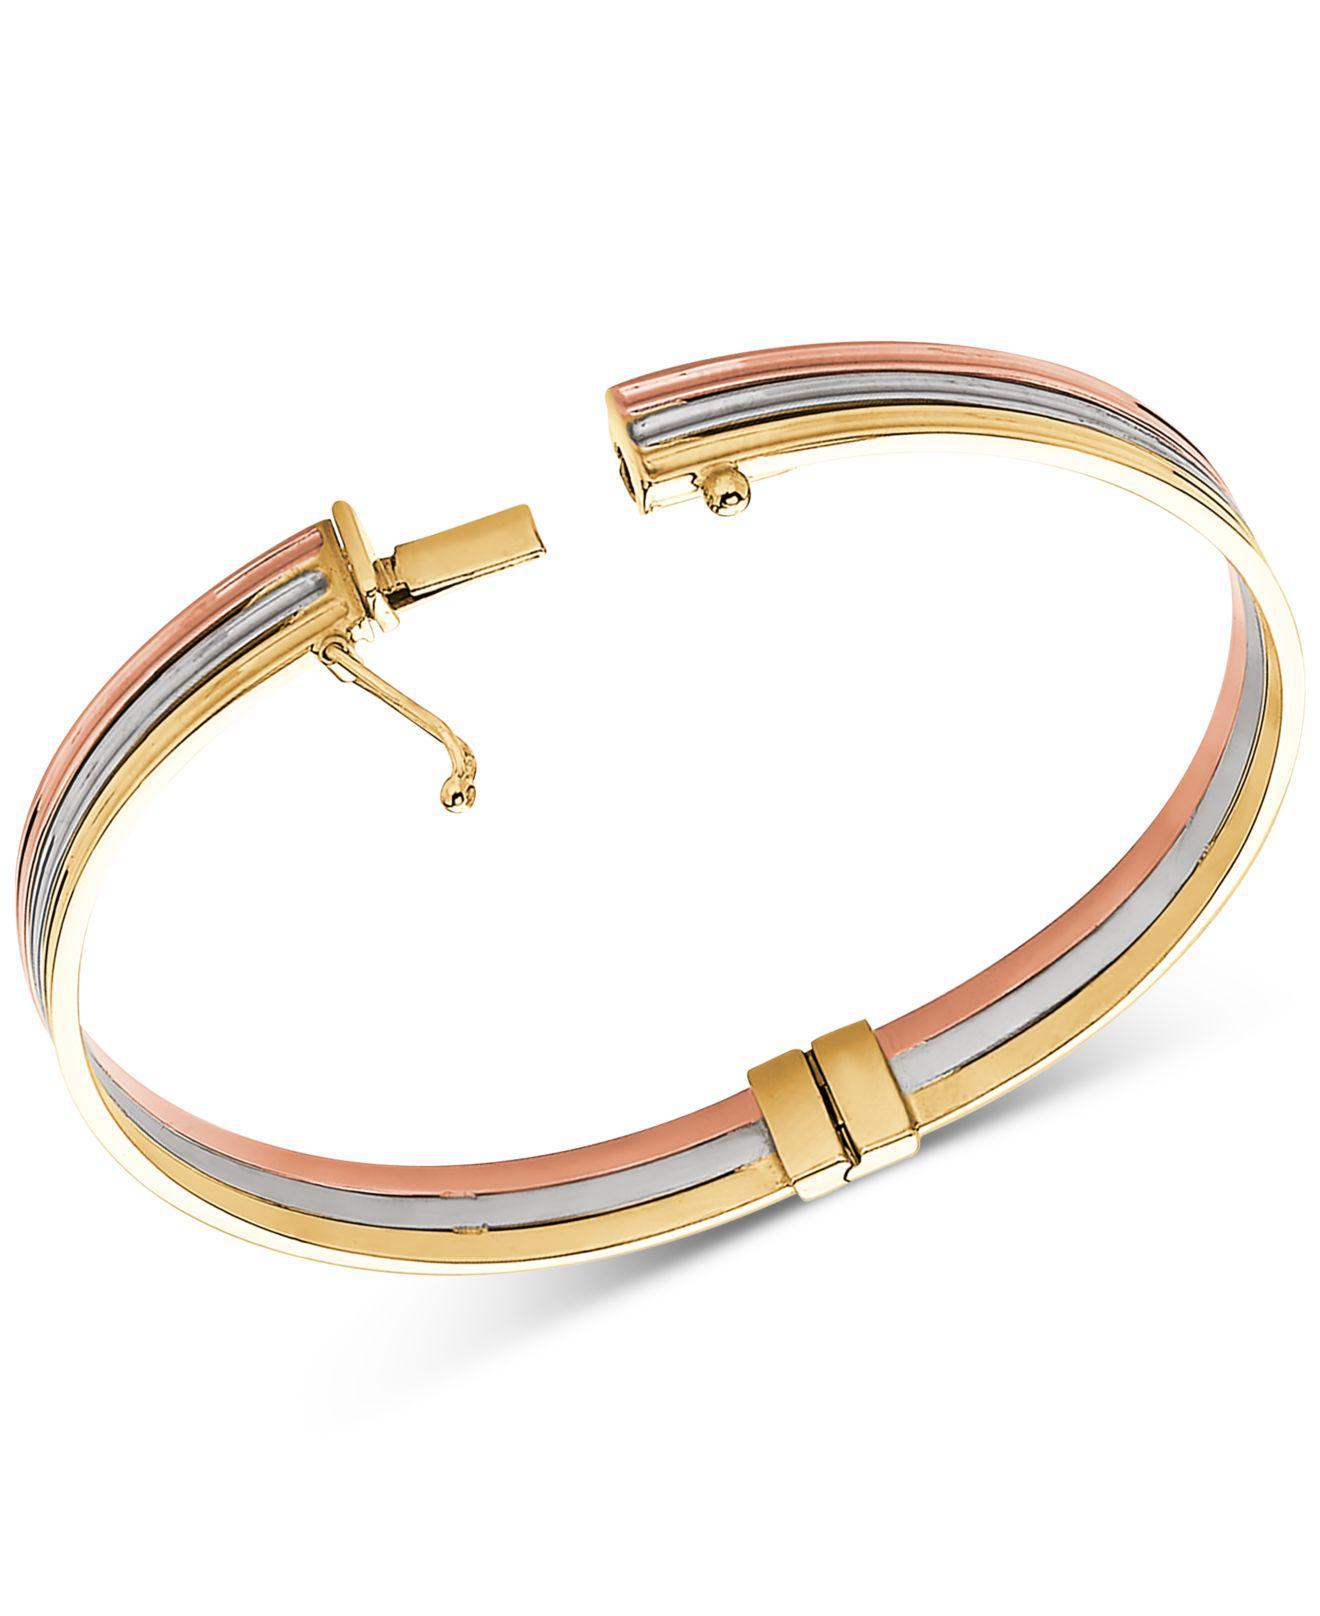 aa061f5ed4630 Women's Metallic Tricolor Stacked Bangle Bracelet In 14k Gold, White Gold &  Rose Gold